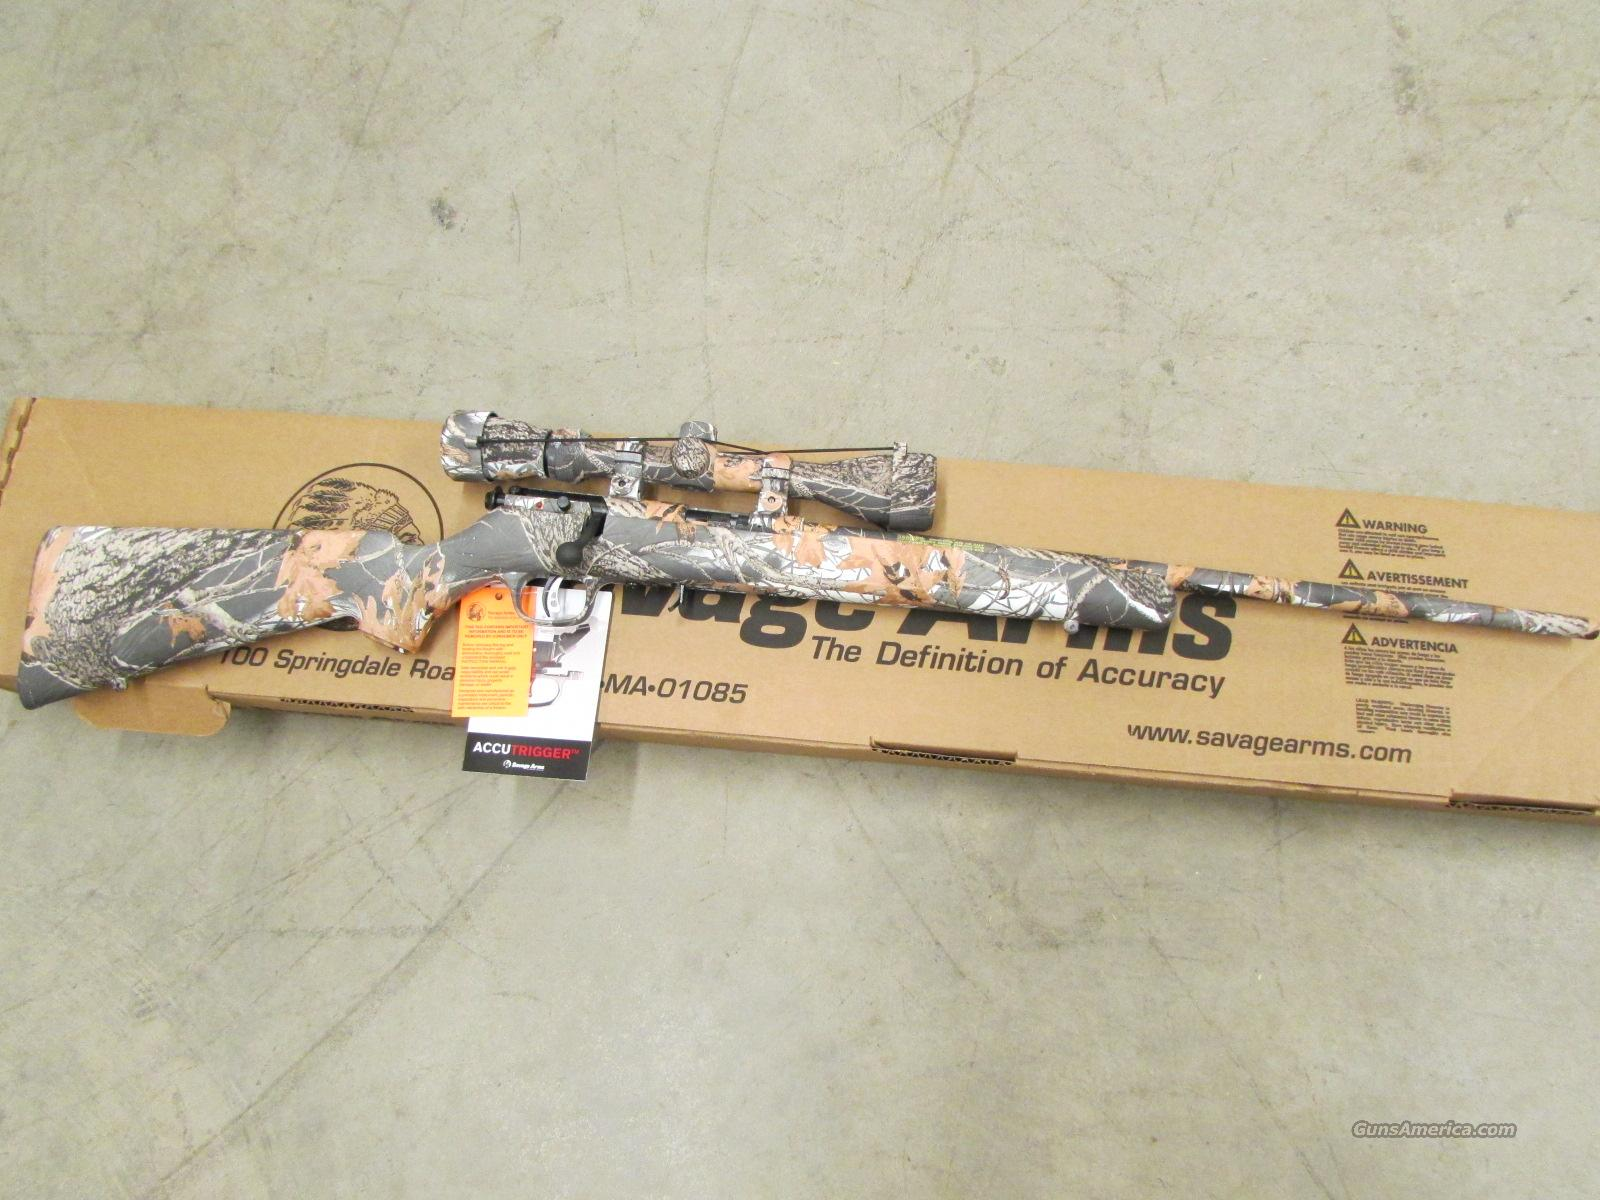 Savage Model 93R17 XP Snow Camo & Scope .17 HMR 96776  Guns > Rifles > Savage Rifles > Accutrigger Models > Sporting